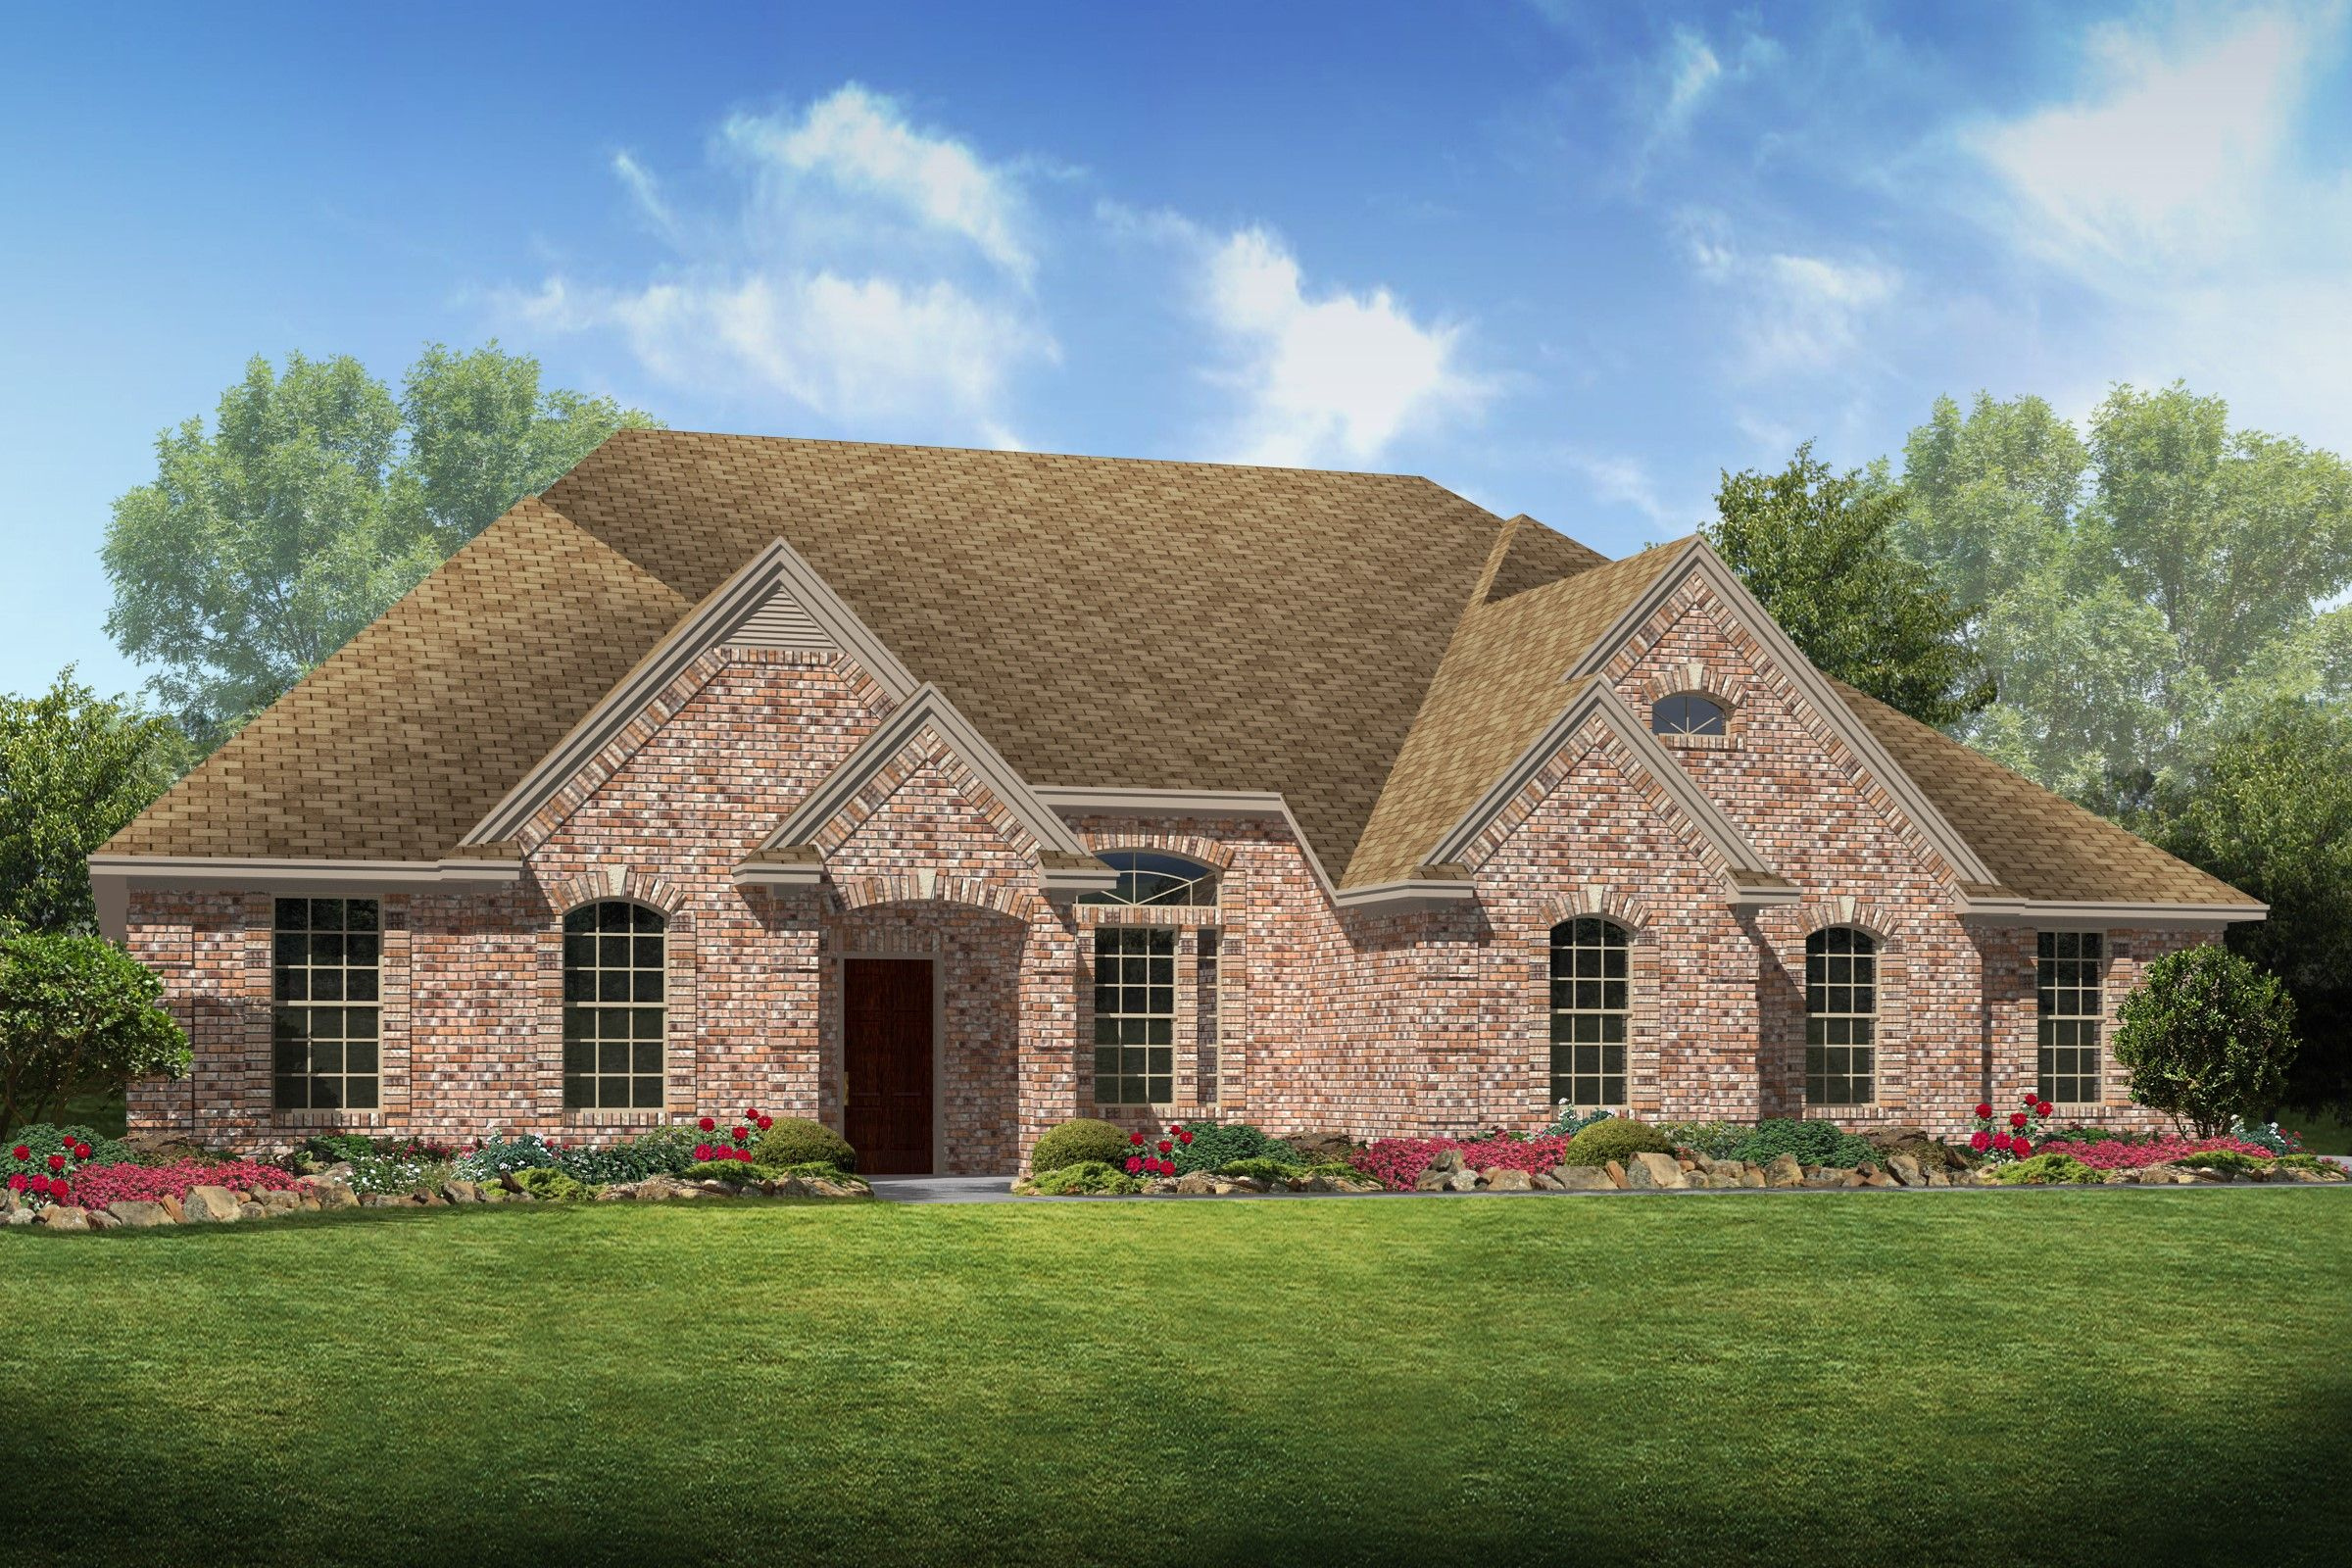 Single Family for Sale at Thunder Bay - Jackson Mccollum Park Rd & Thunder Bay Beach City, Texas 77523 United States